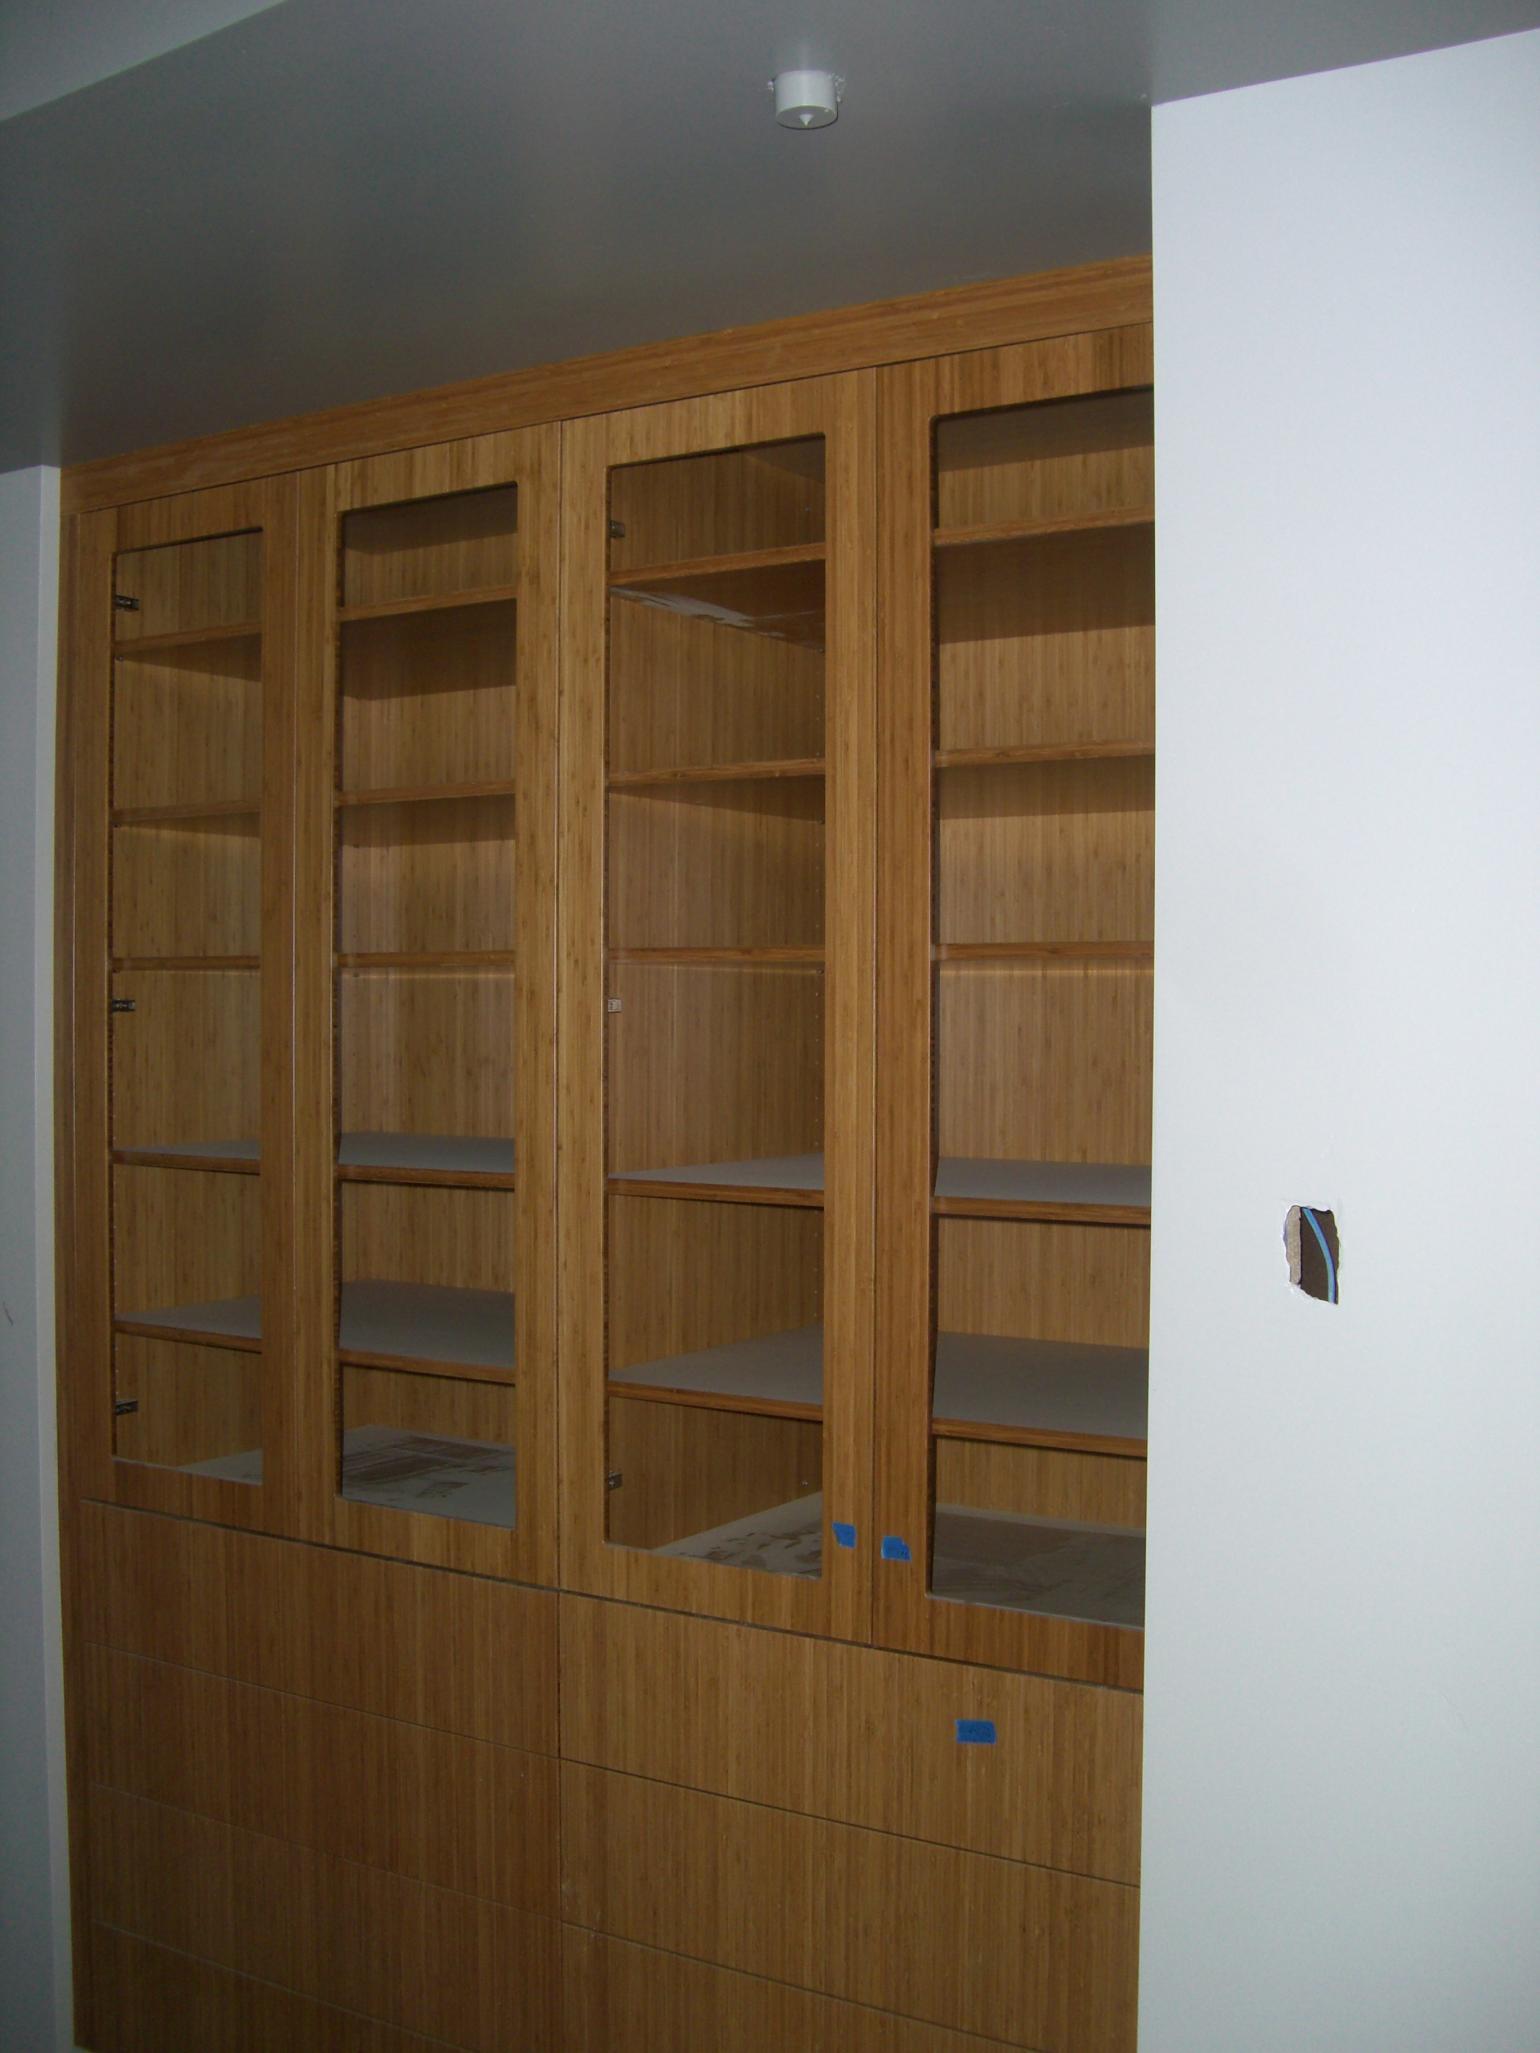 Bamboo Cabinets Kitchen Bamboo Kitchen Cabinet Doors Uk Cliff Kitchen